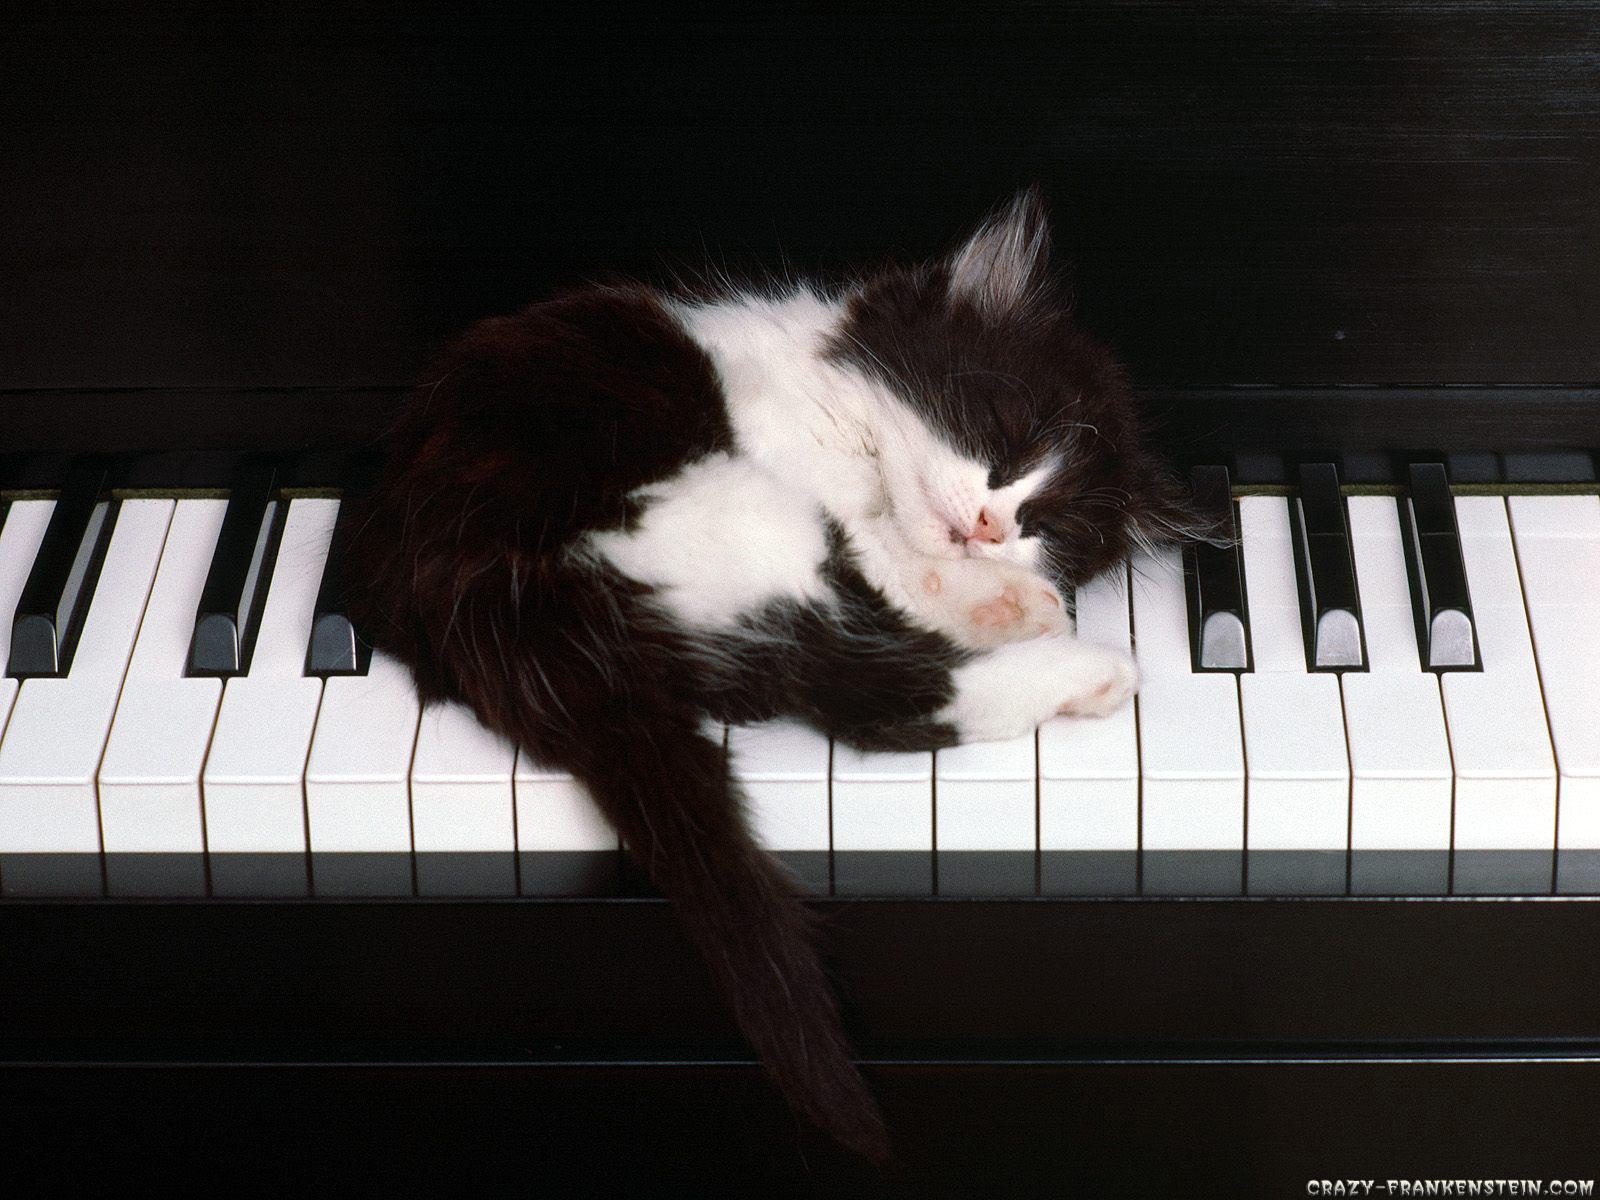 http://2.bp.blogspot.com/_gPfr_t87hWk/TFATC4dUsMI/AAAAAAAAA5o/bTE06n-EtrE/s1600/black-white-cat-wallpaper-1600x1200.jpg